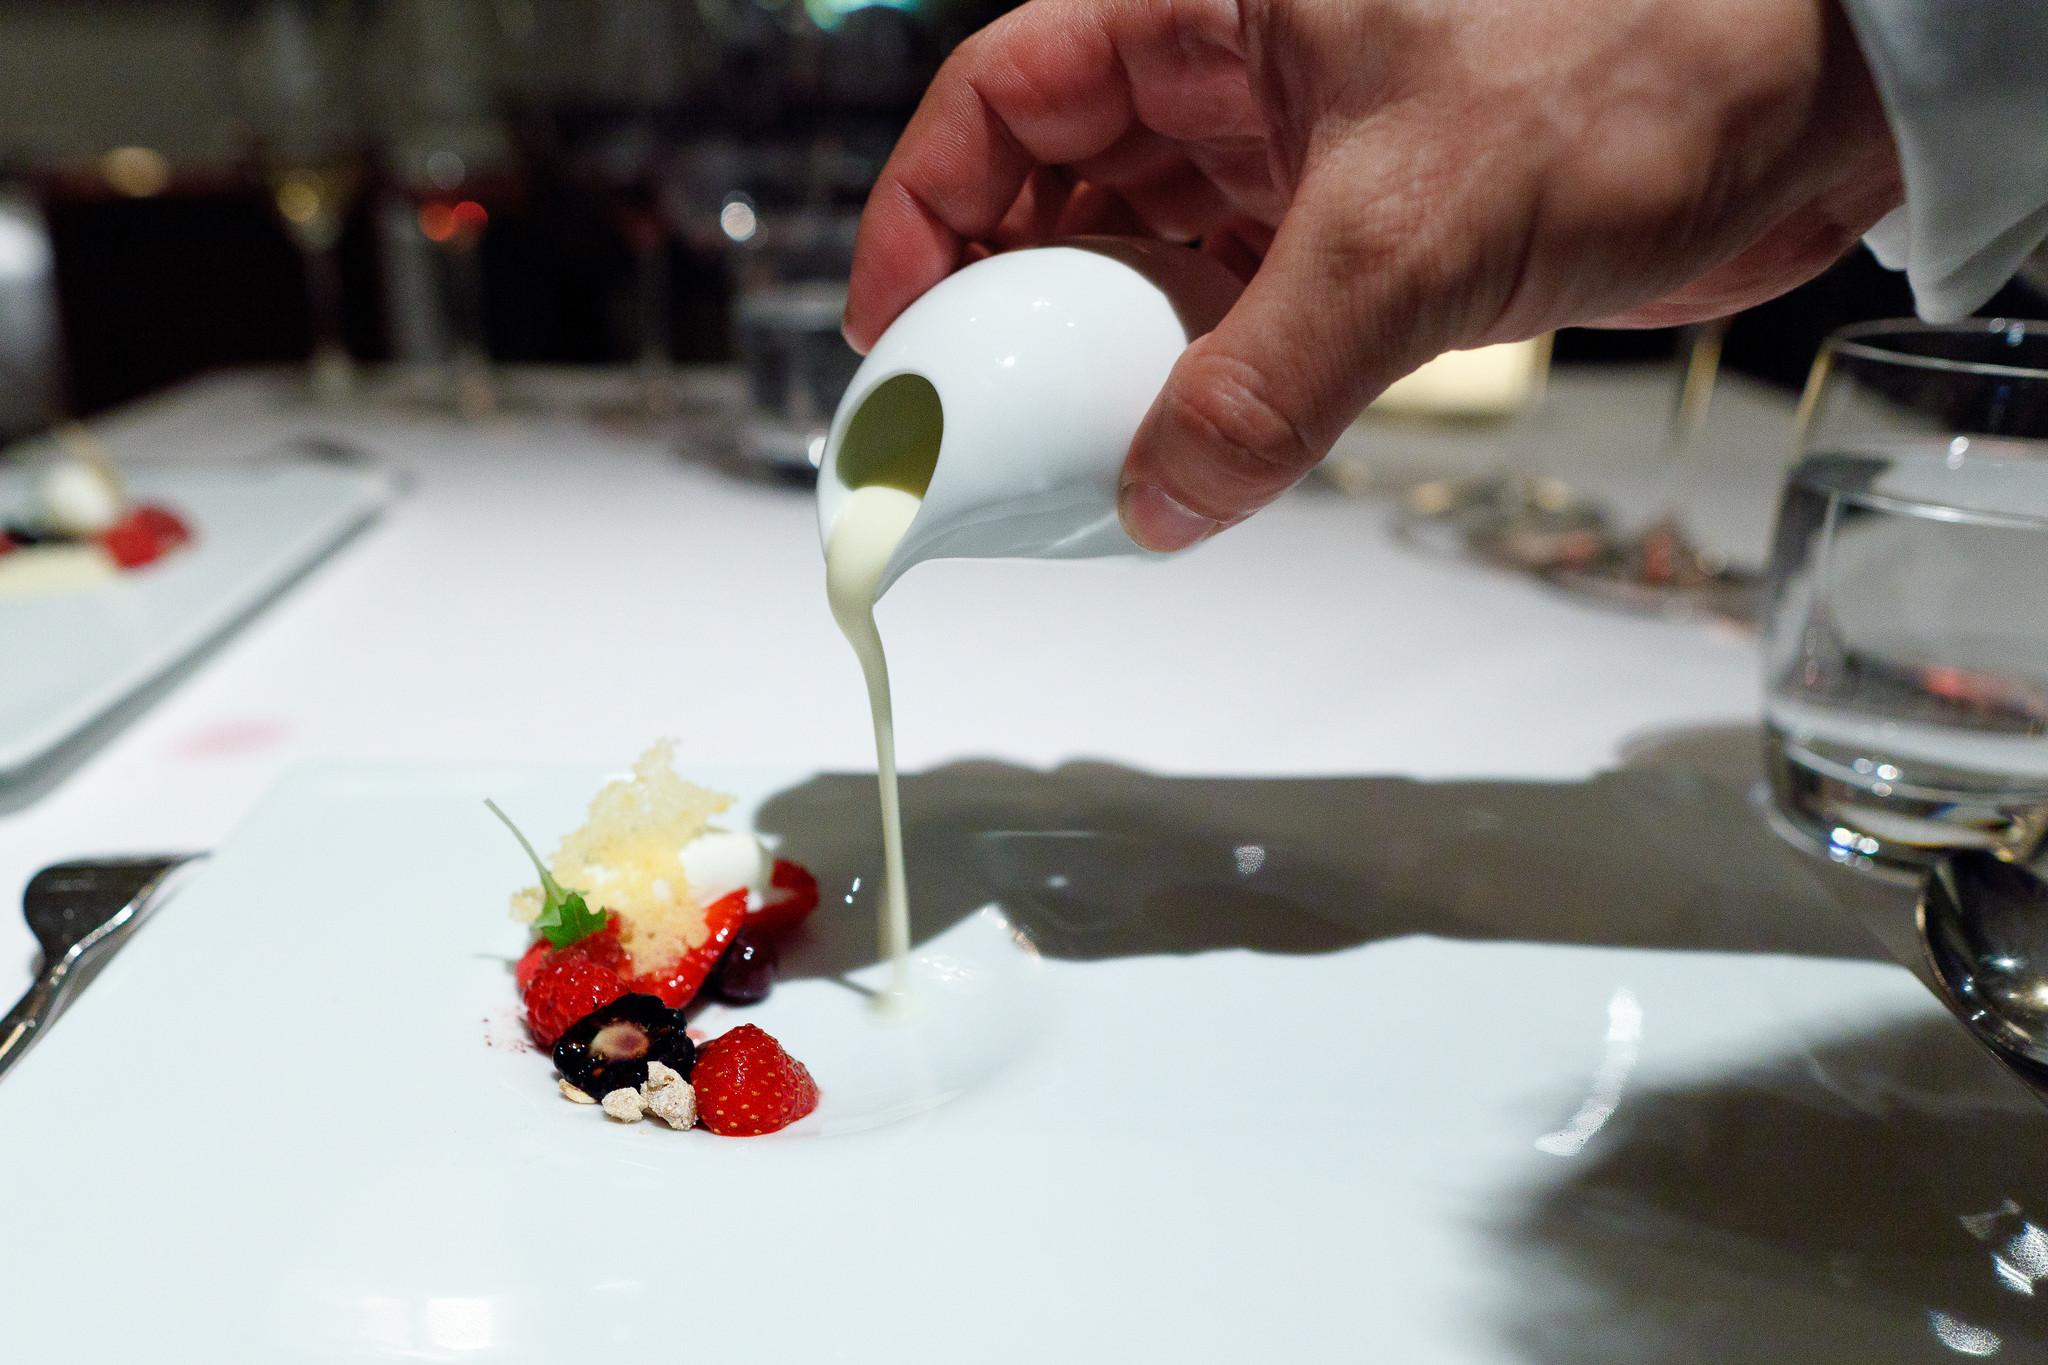 16th Course - Summer berries, roasted and raw, lemon cream with açaí granite, yogurt sorbet